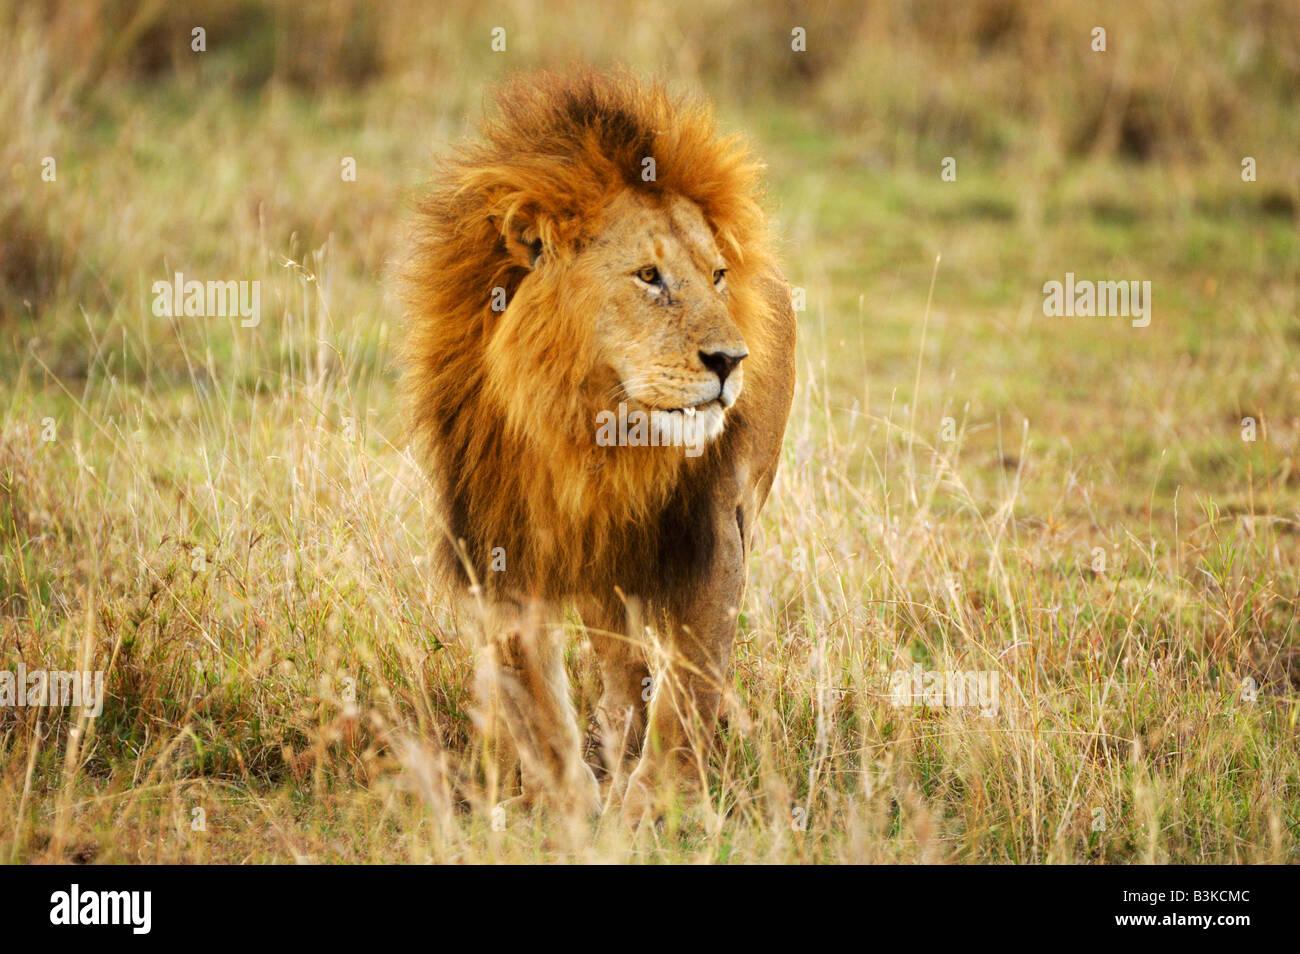 Panthera leo el león africano macho África Kenia Masai Mara Imagen De Stock